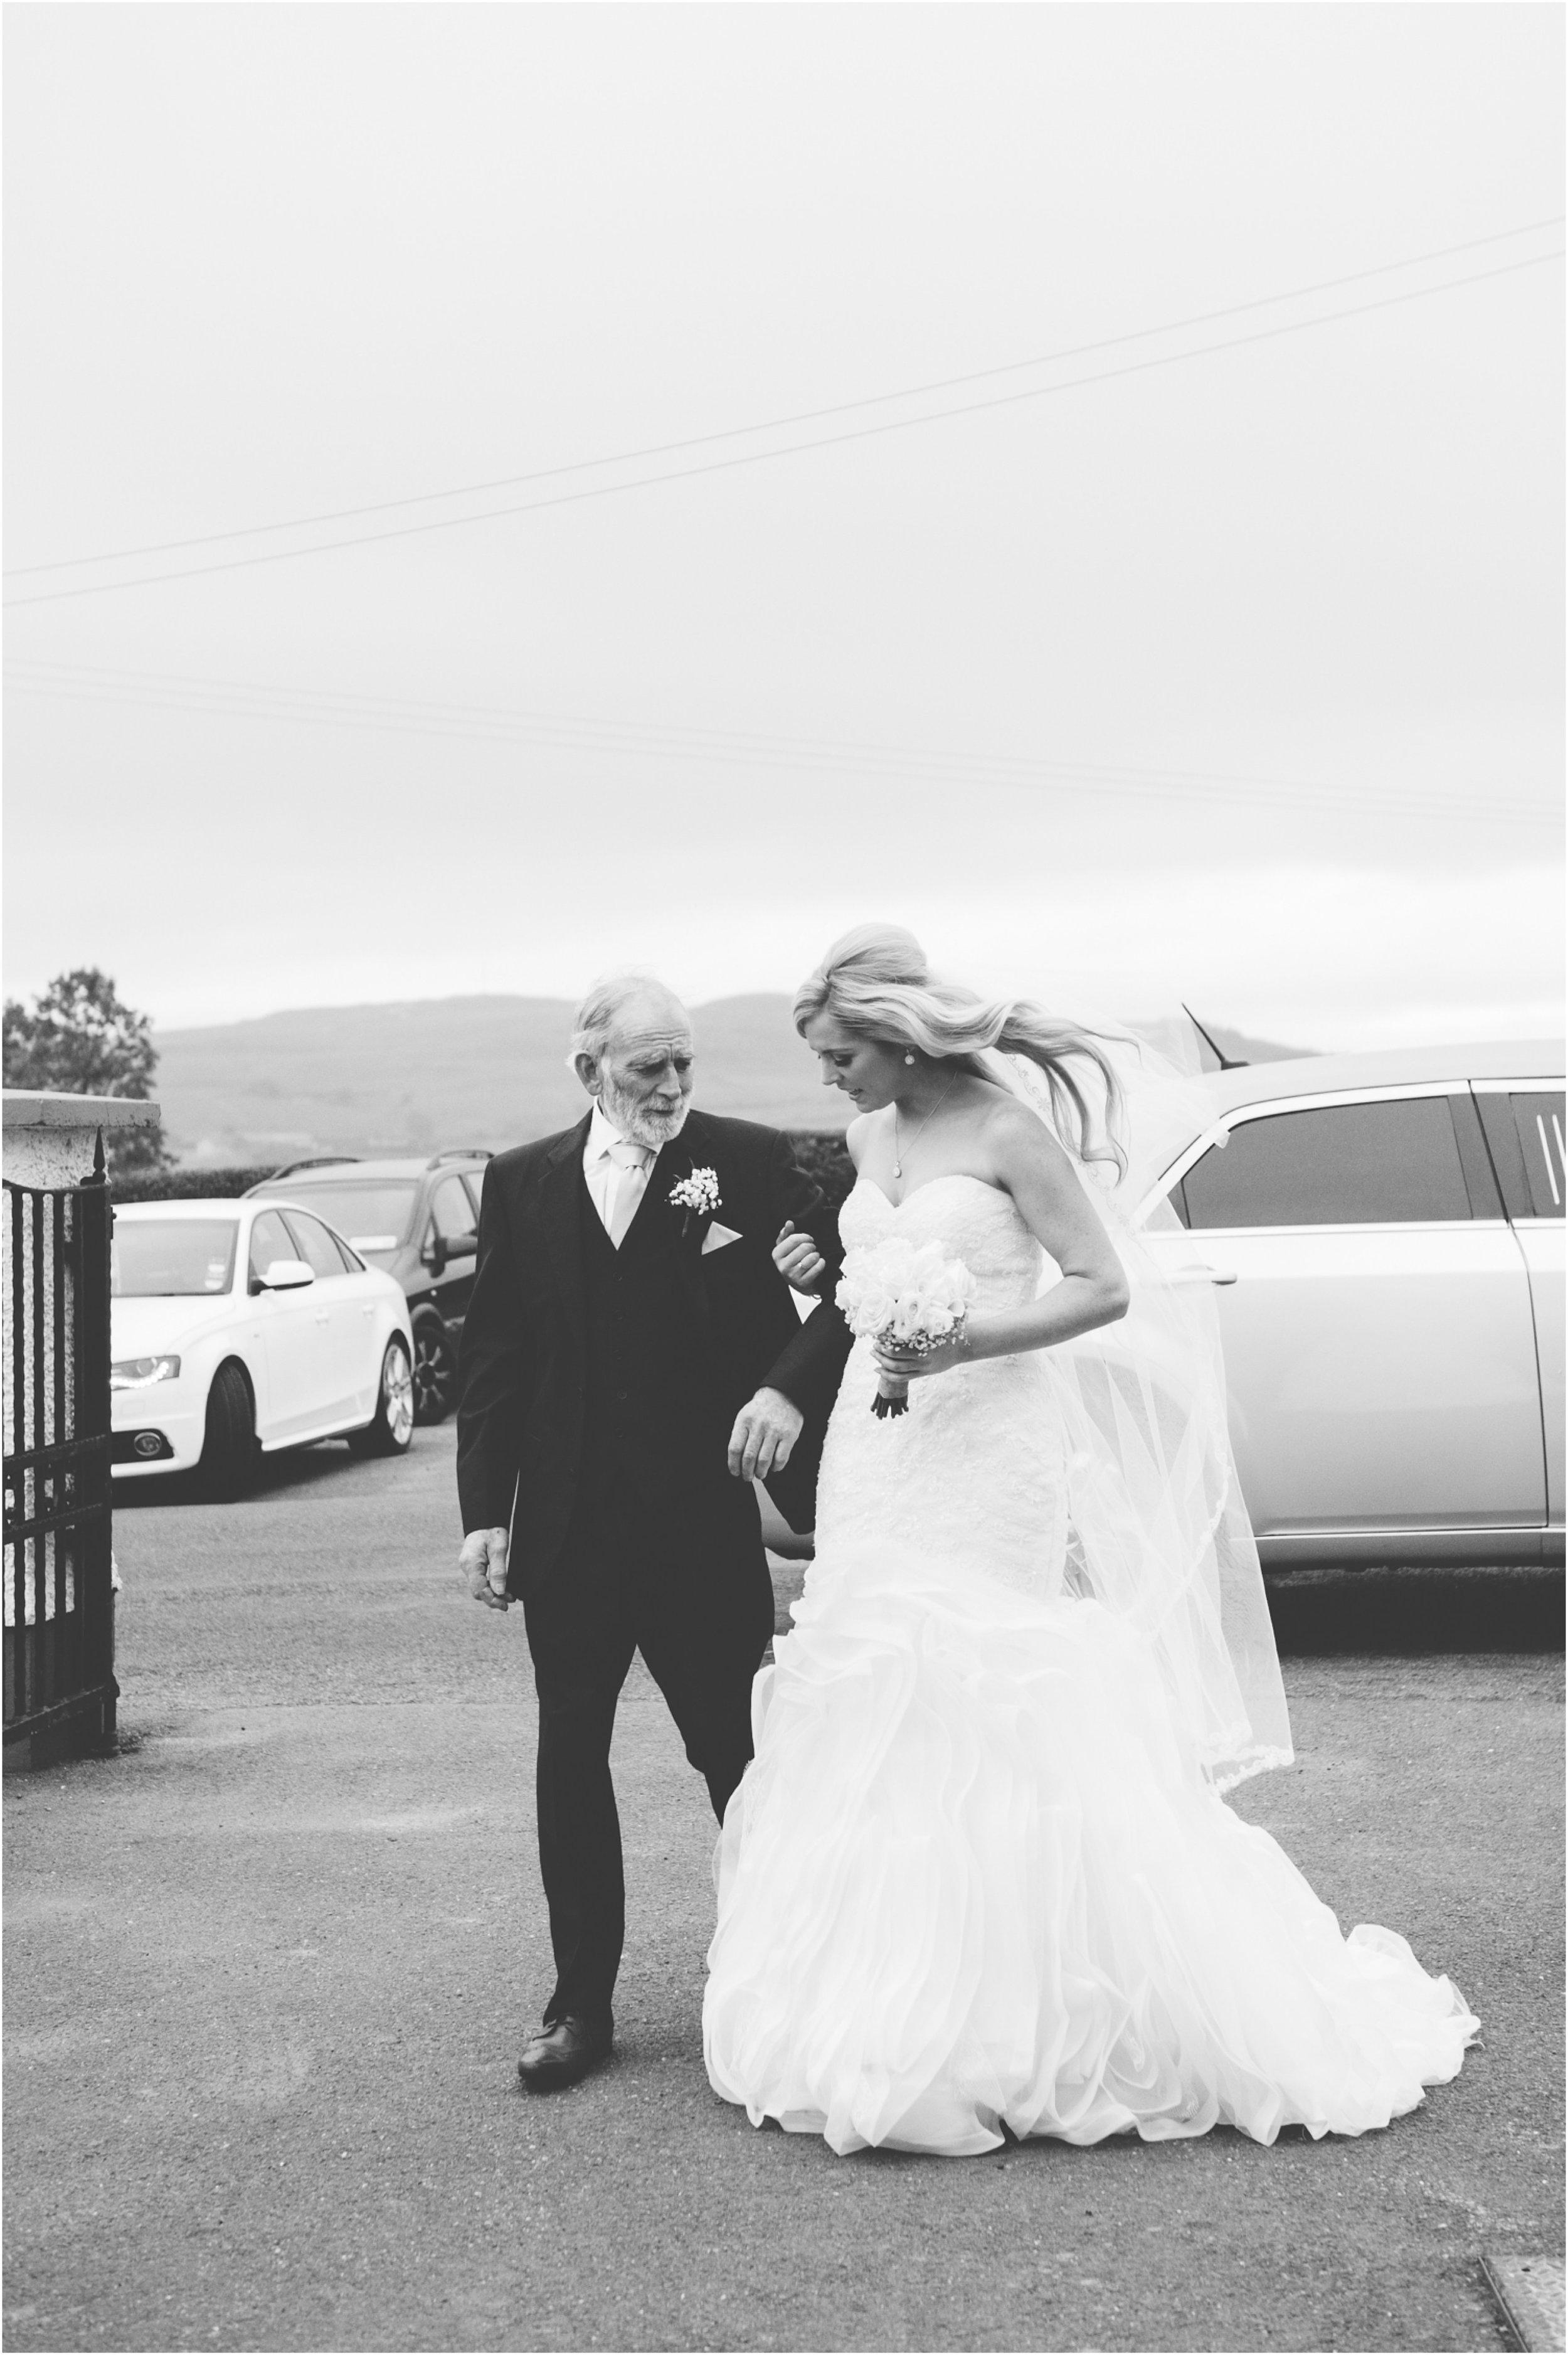 laura-lee-stephen-lough-erne-resort-wedding-photography-co-fermanagh_0027.jpg